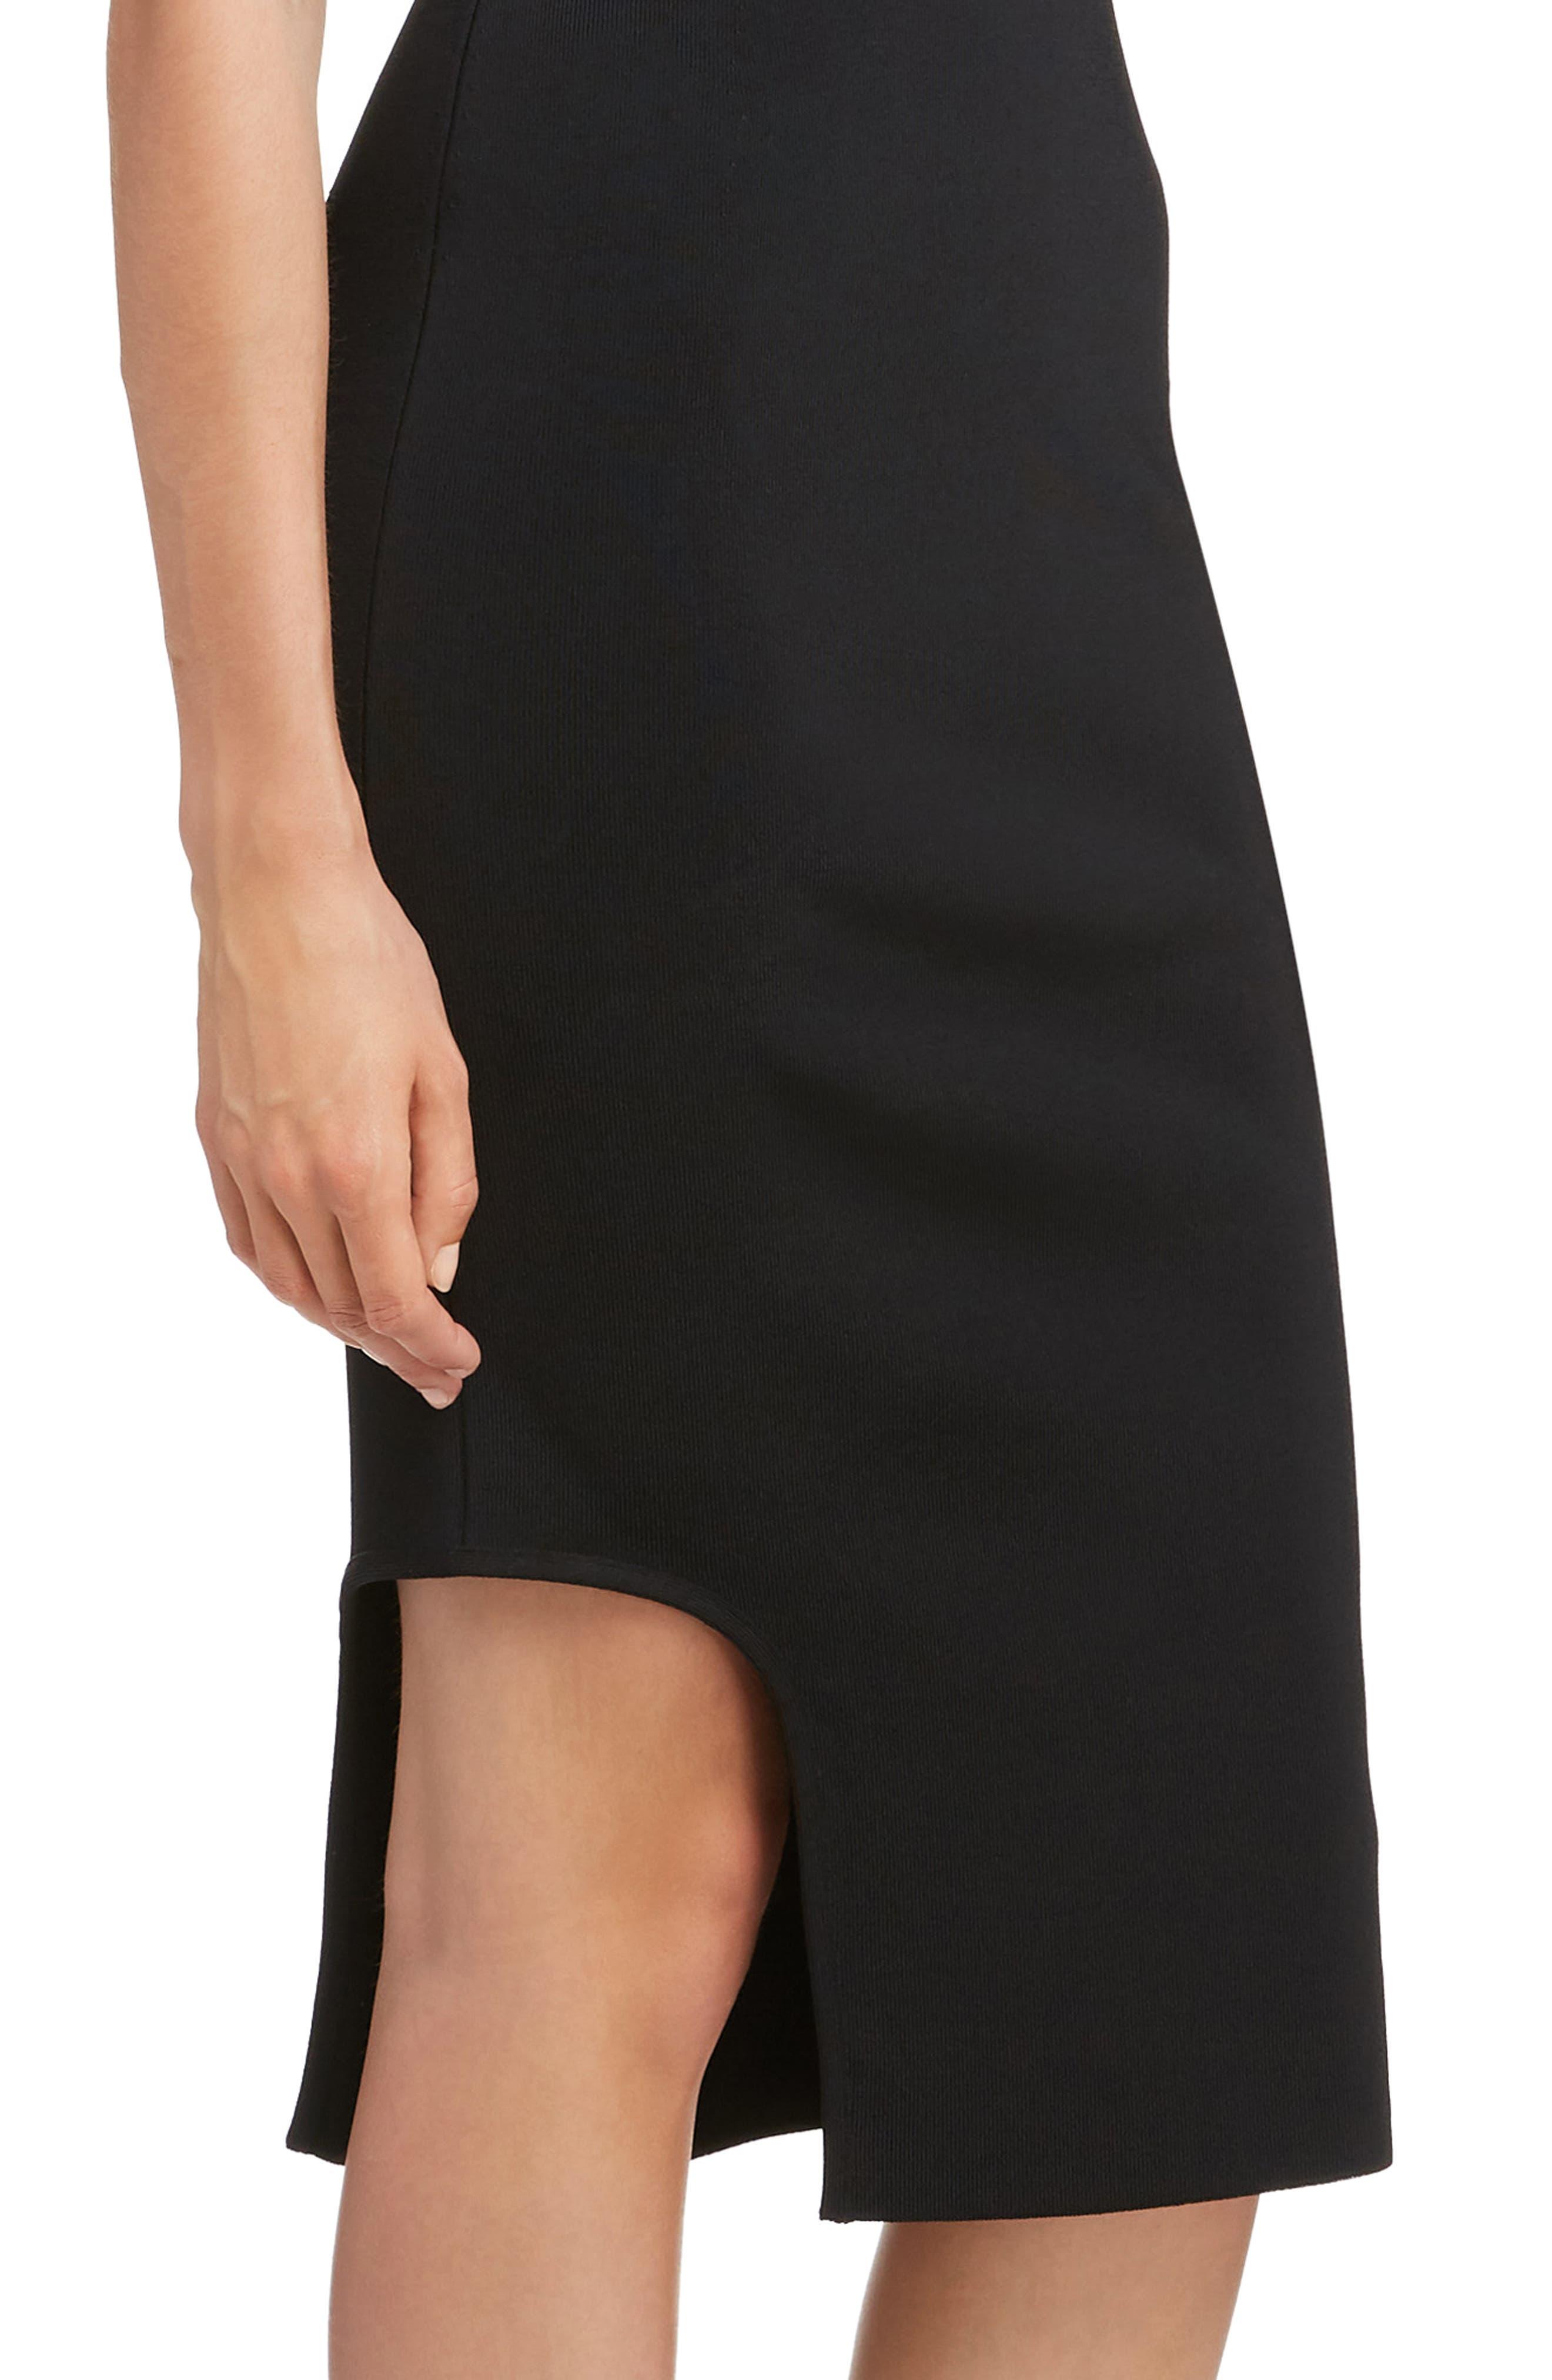 VICTORIA BECKHAM, Cutout Knit Dress, Alternate thumbnail 4, color, BLACK